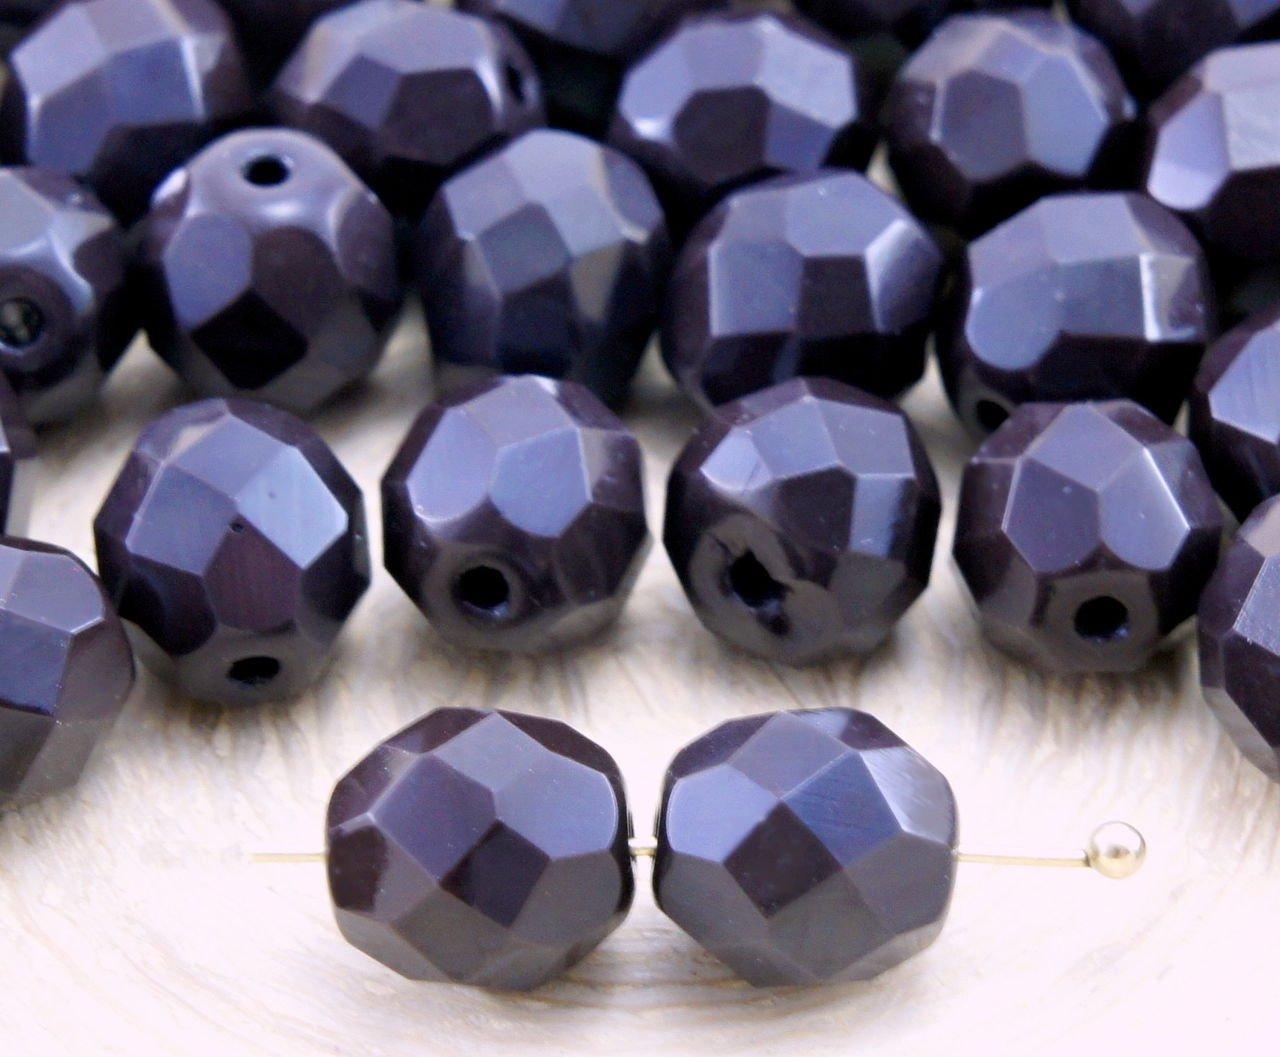 20pcs Opaco Marr/ón Chocolate Oscuro Ronda Facetas de Fuego Pulido Espaciador checa Perlas de Vidrio de 8mm